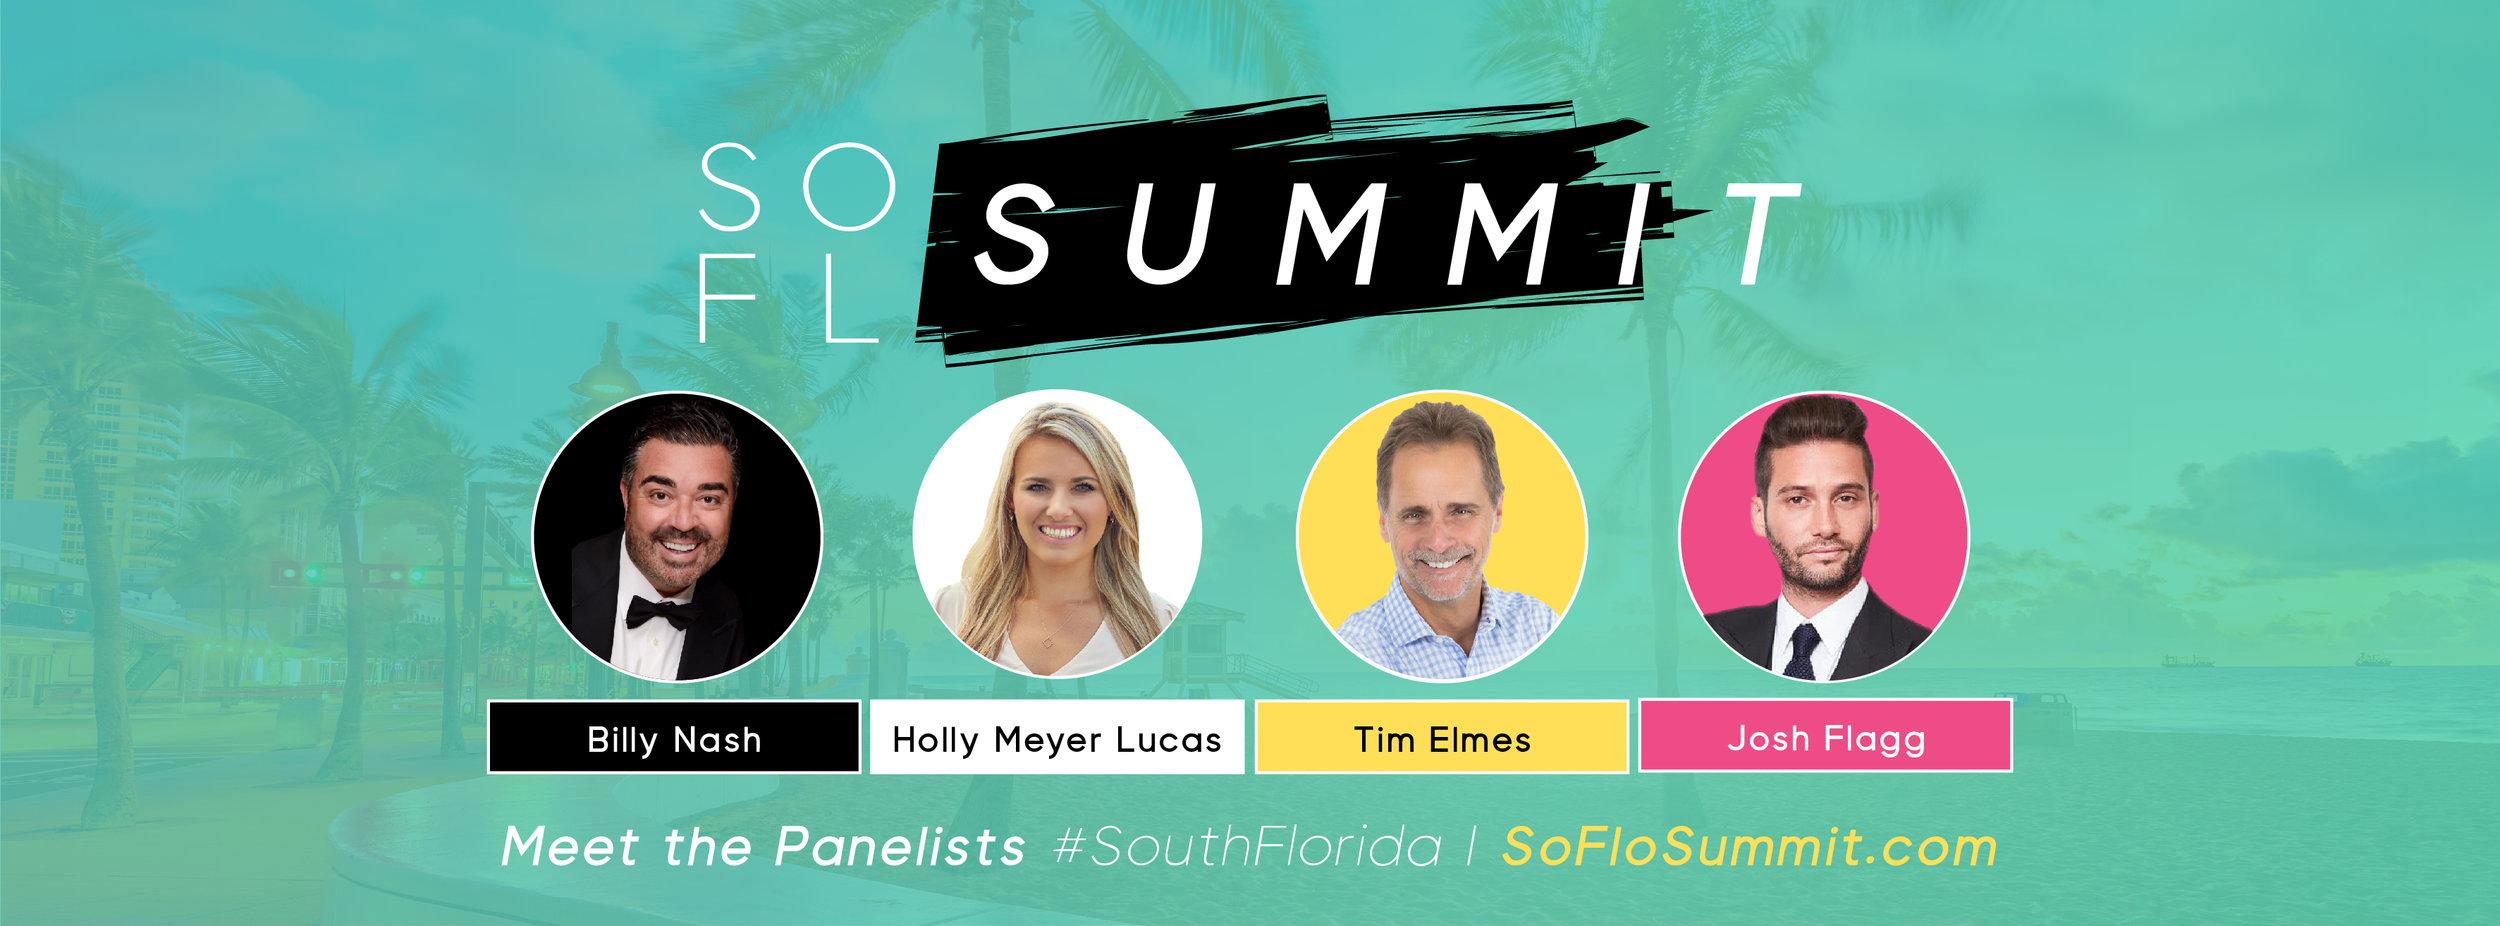 FB Covers South Florida Summit-02.jpg